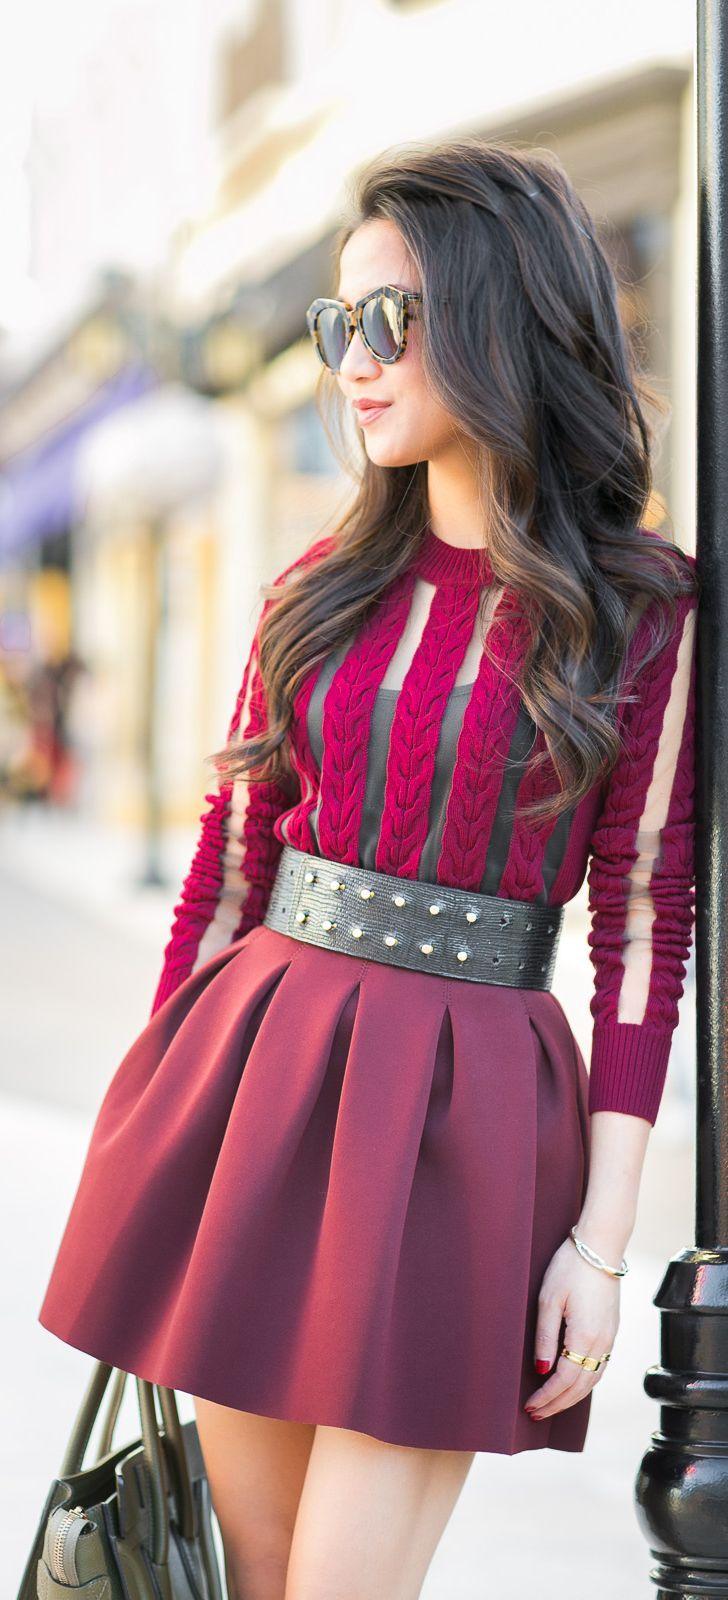 Very impressive and stylish